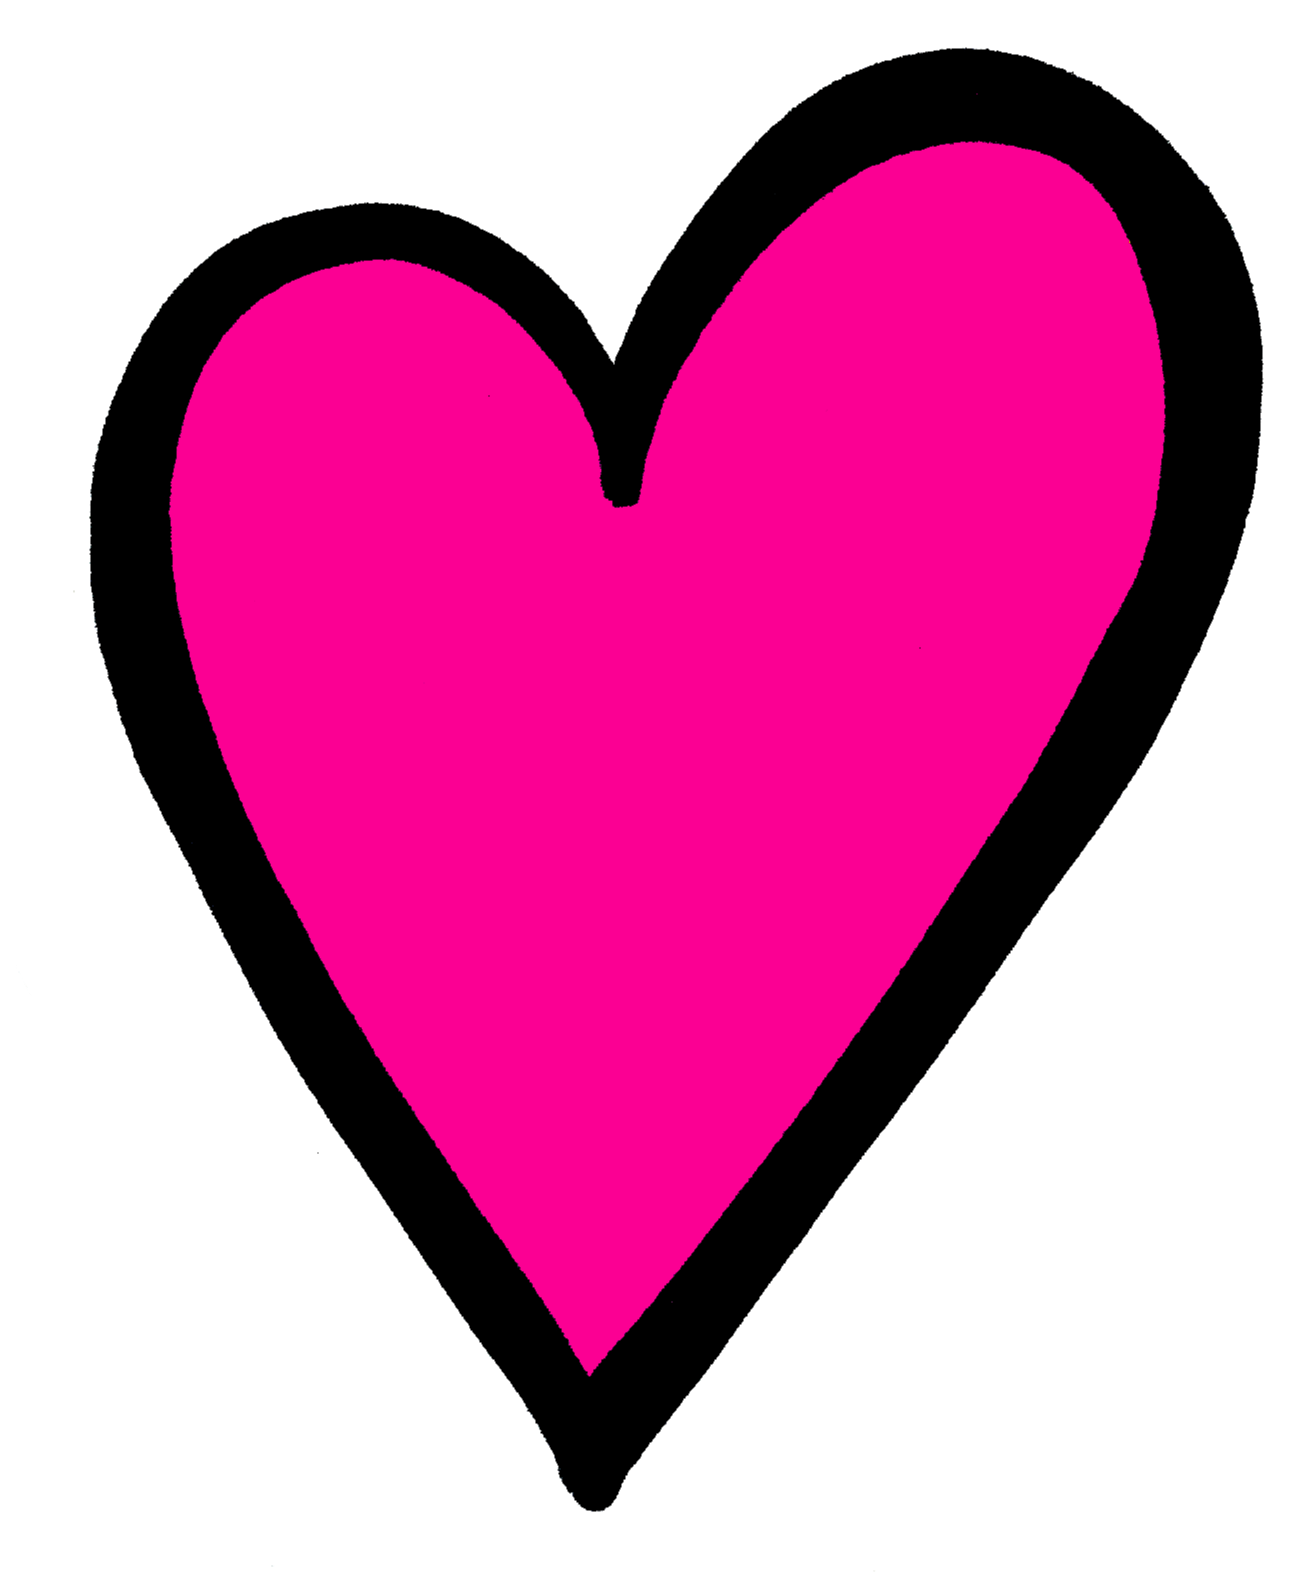 Download Hot Pink Heart Transparent Image HQ PNG Image ...